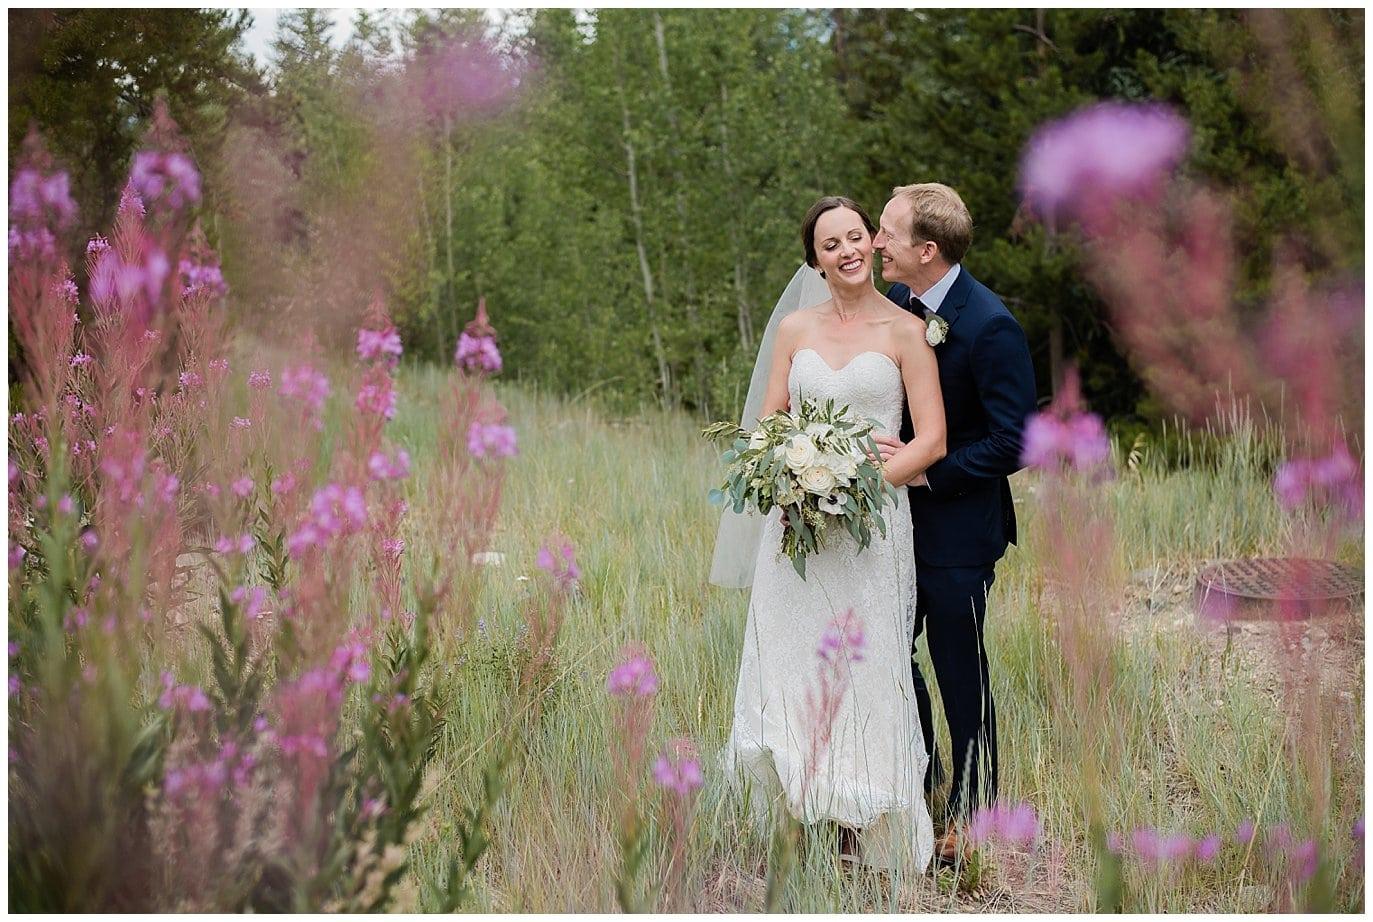 bride and groom portrait with summer purple colorado flowers at Arapahoe Basin Black Mountain Lodge Wedding by Arapahoe Basin Wedding Photographer Jennie Crate